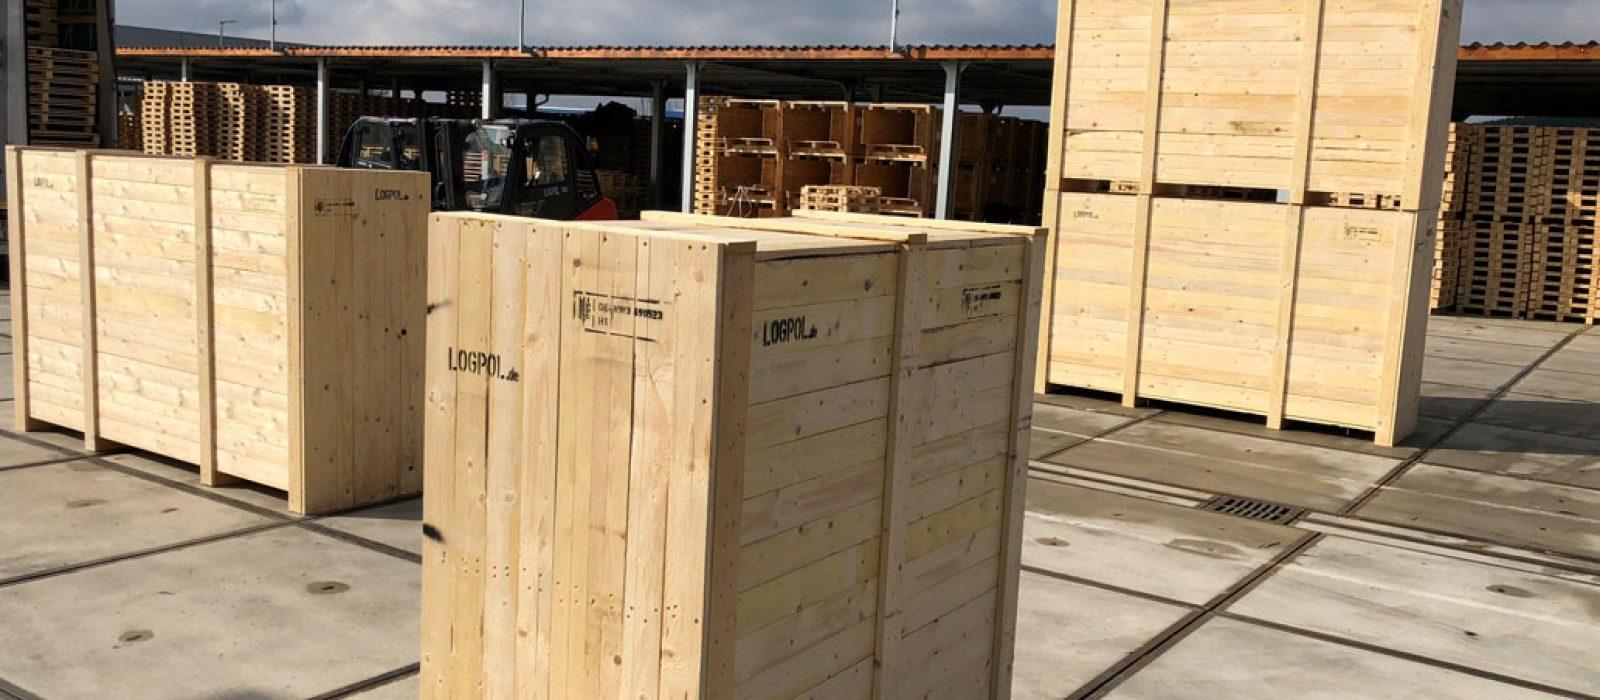 Kiste-Holz-1800×800-LOGPOL